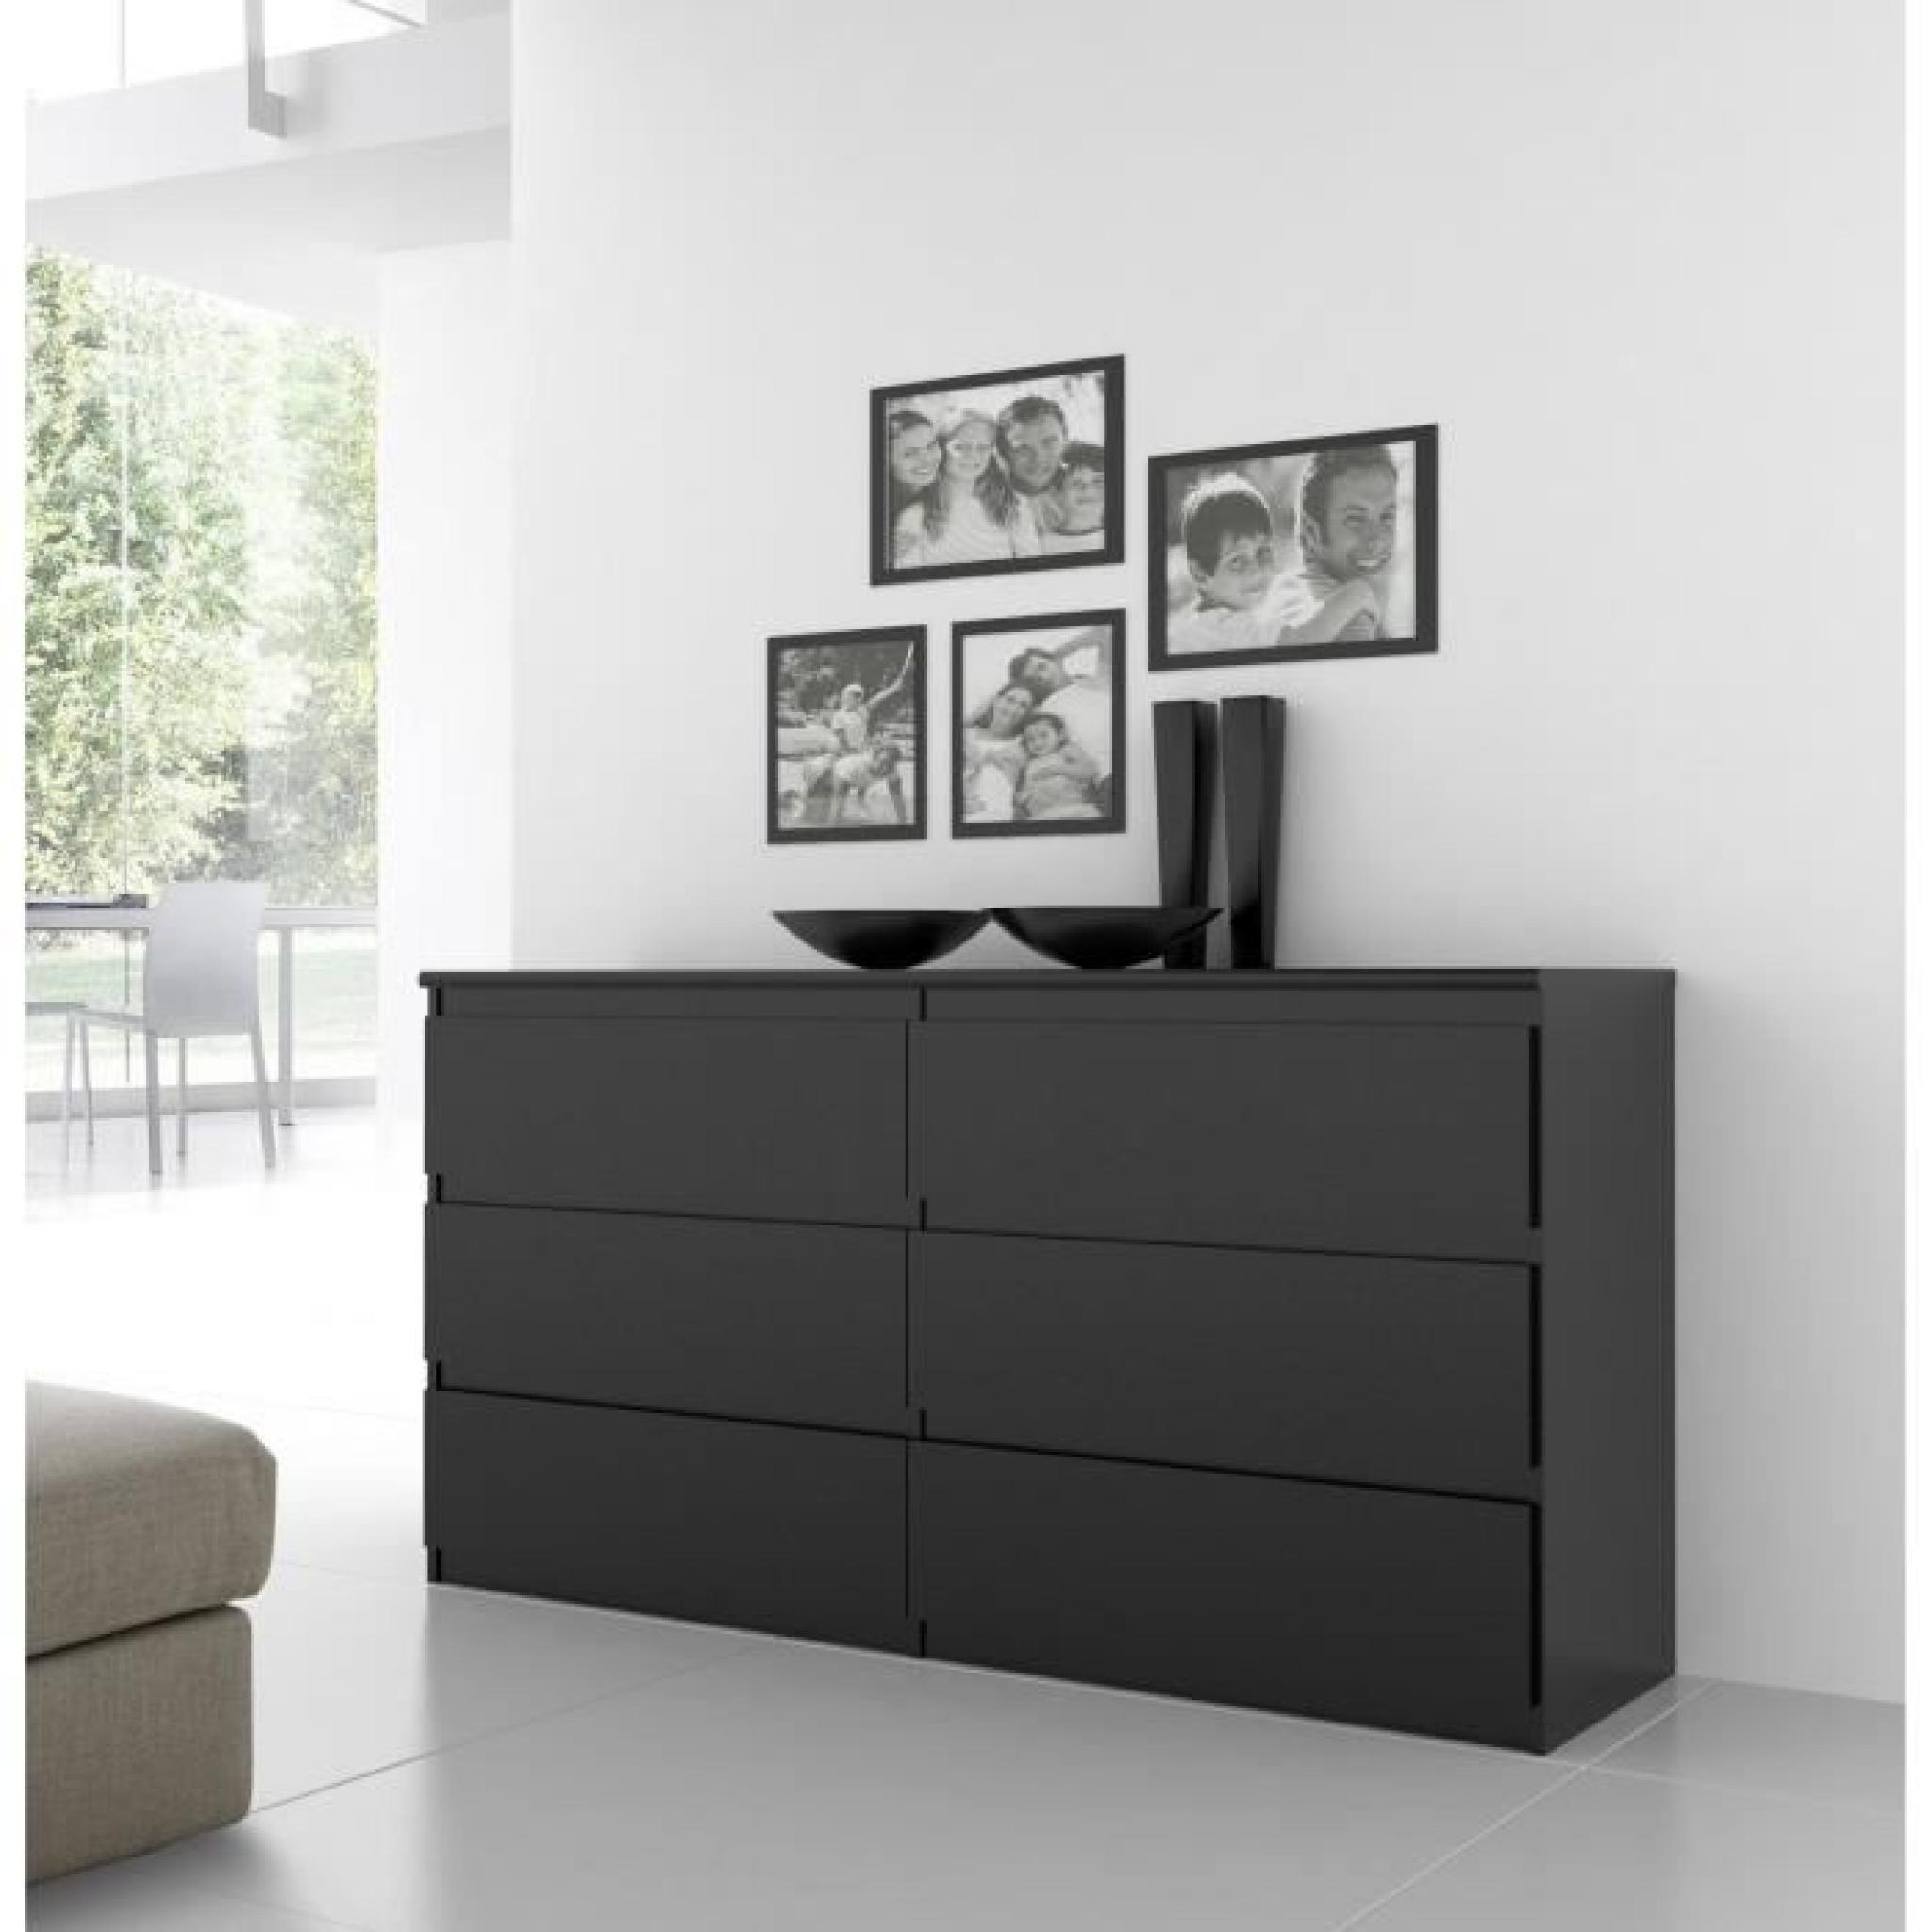 finlandek commode natti 154cm noir achat vente commode. Black Bedroom Furniture Sets. Home Design Ideas